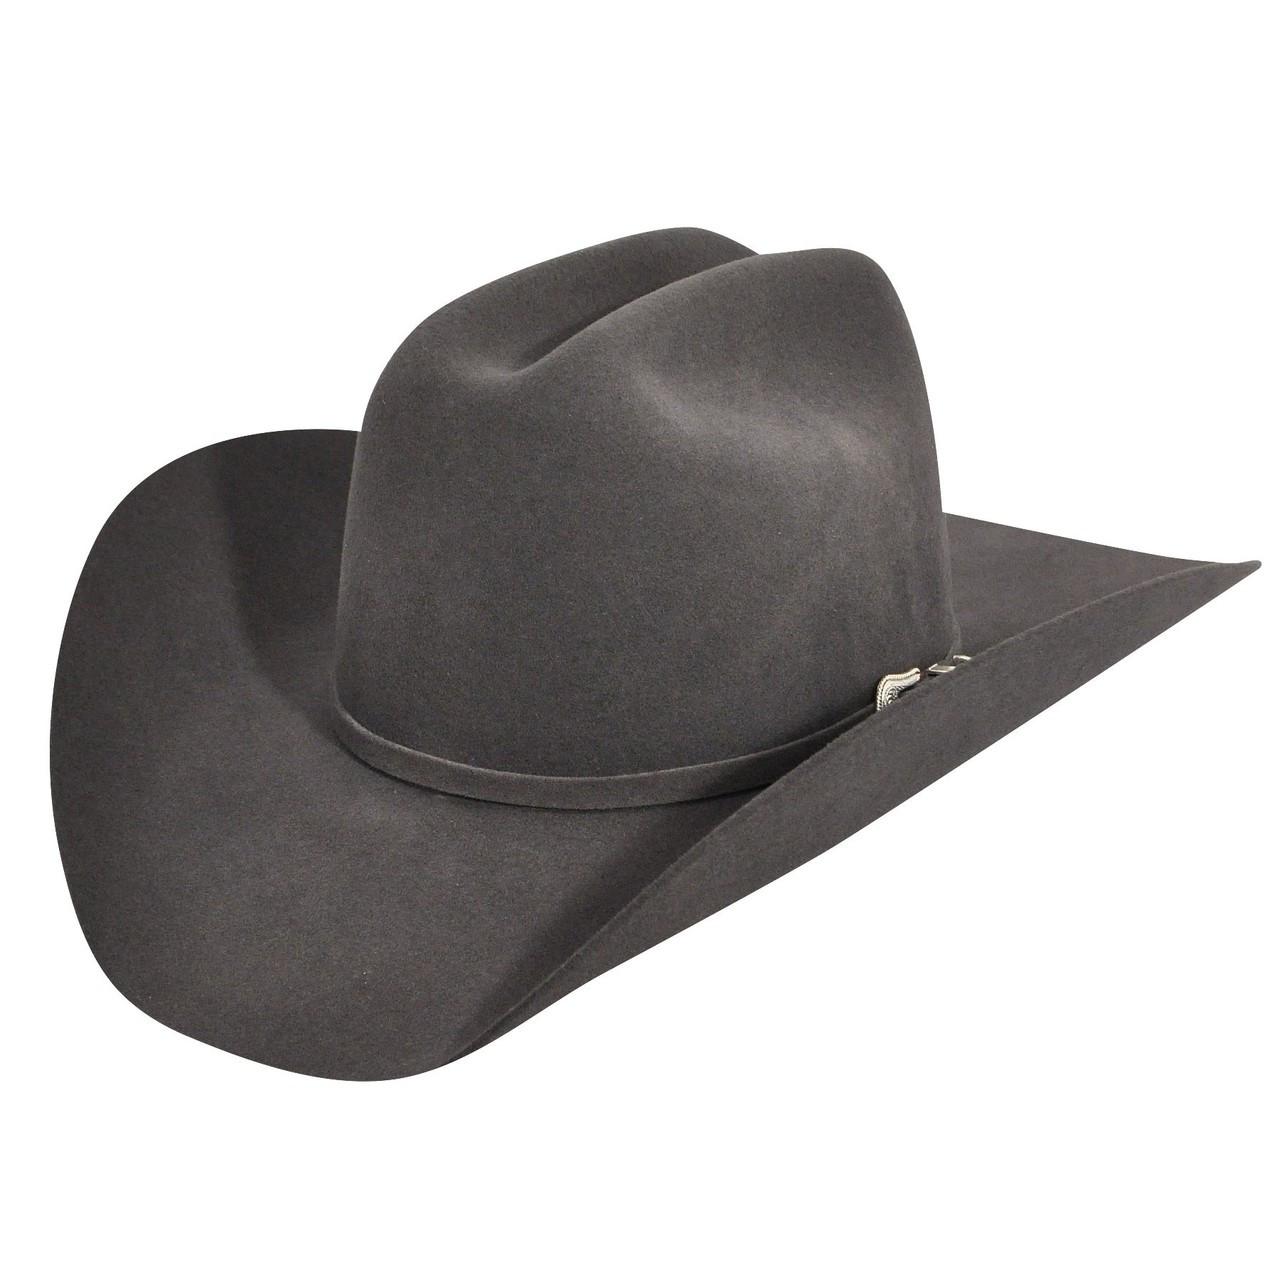 27d6ec52d40 BAILEY 4X STEEL LIGHTNING FELT WESTERN COWBOY HAT W0604A - Jackson s ...